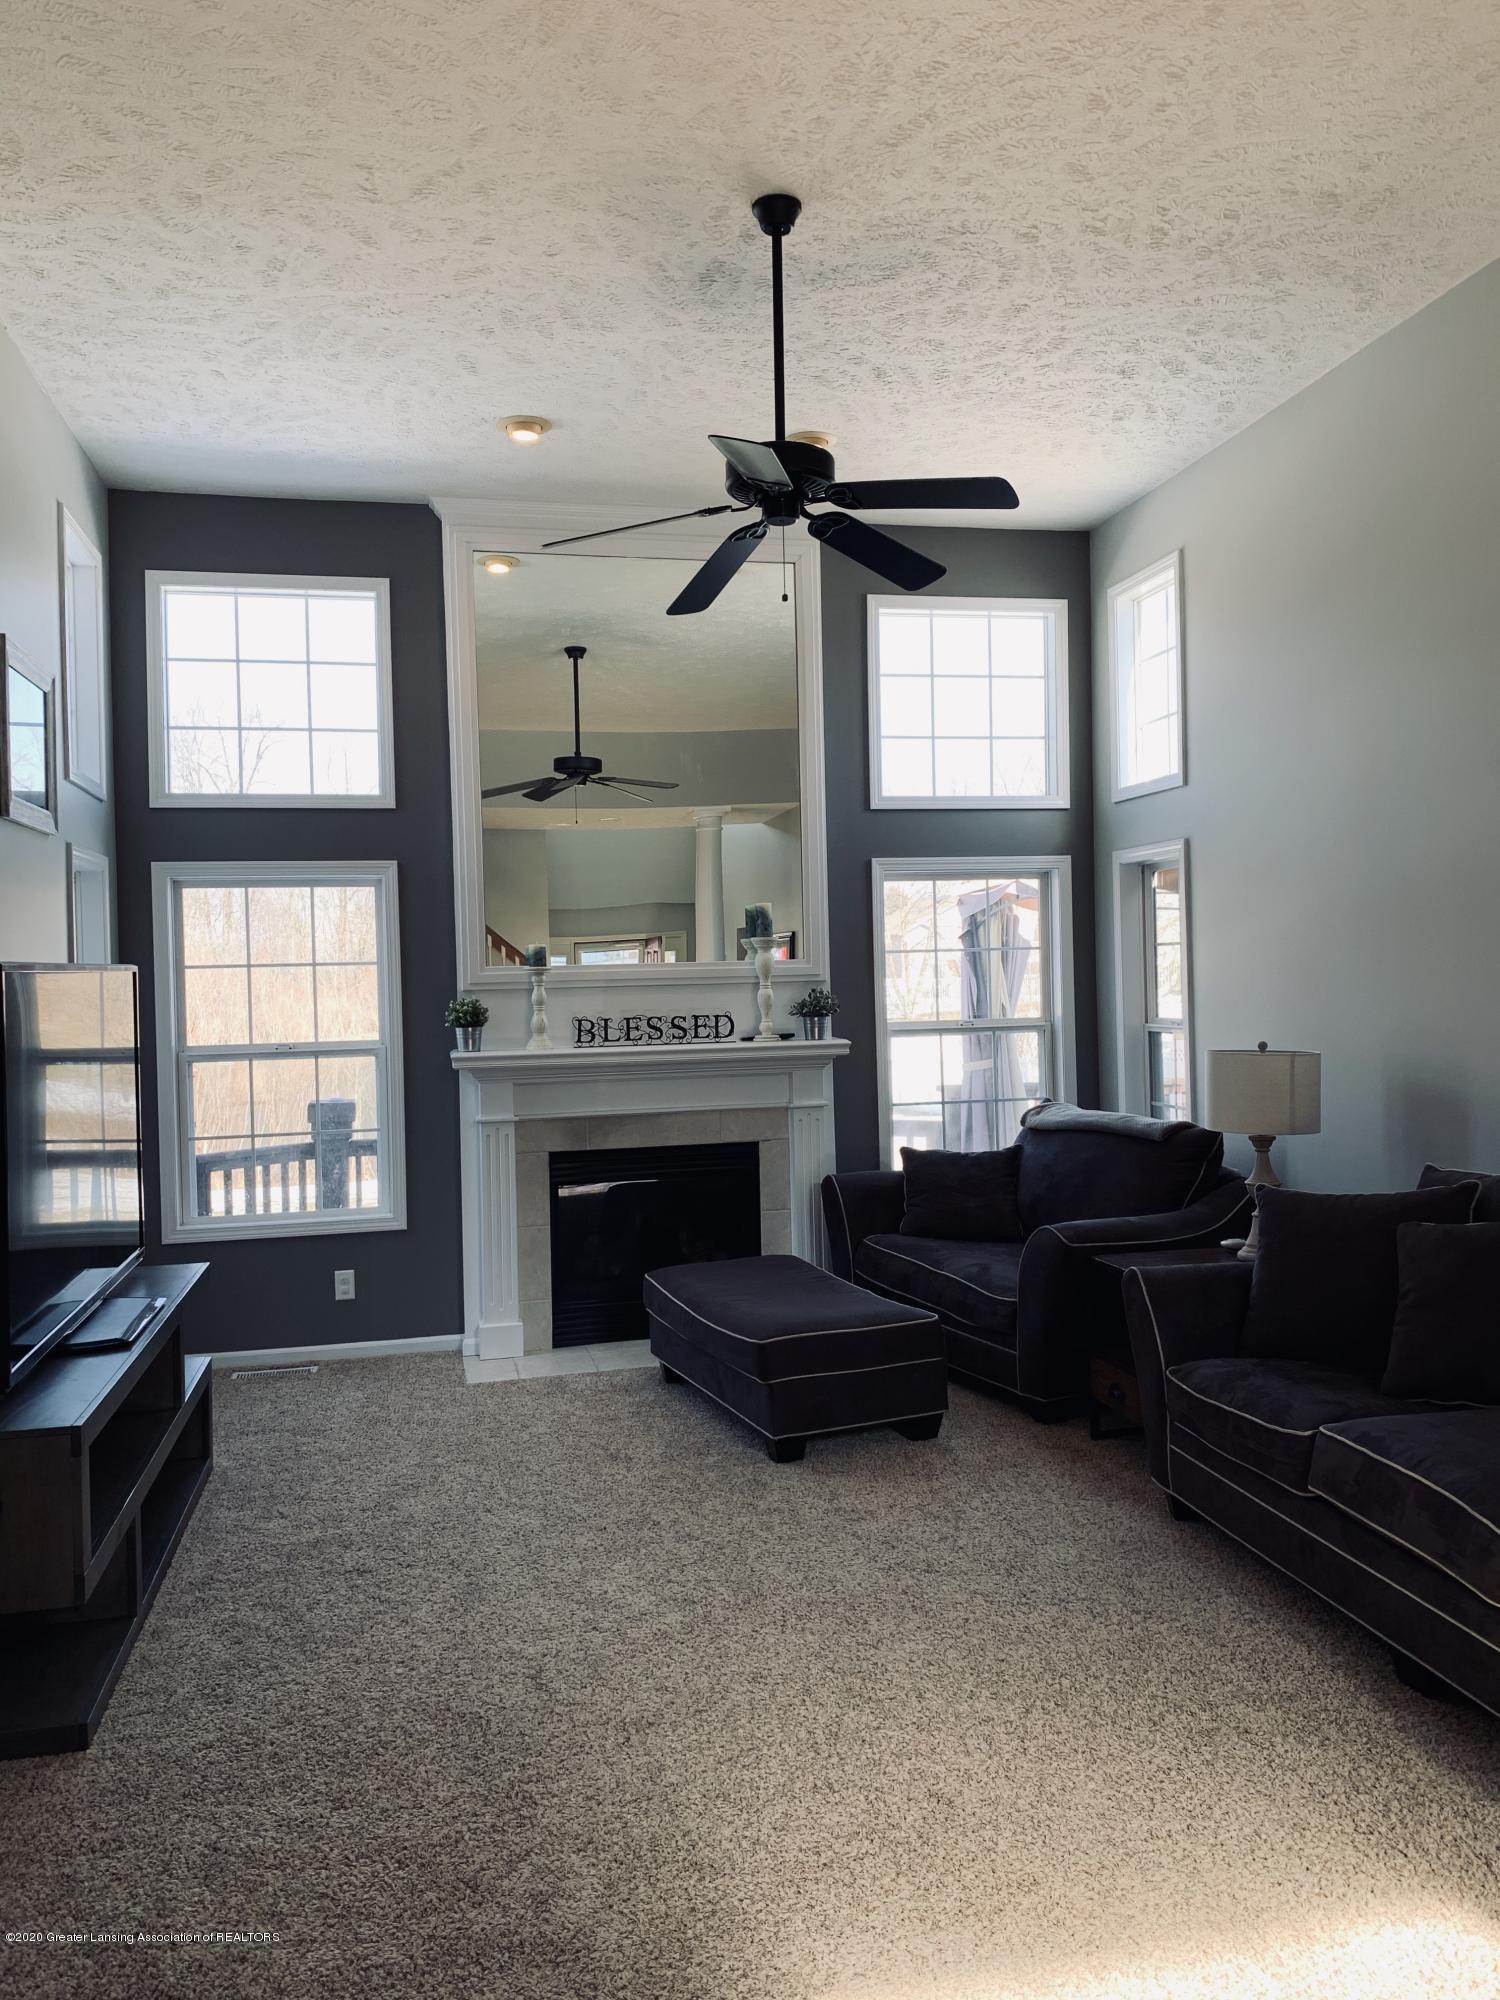 7291 Coneflower Ct - Living room - 19